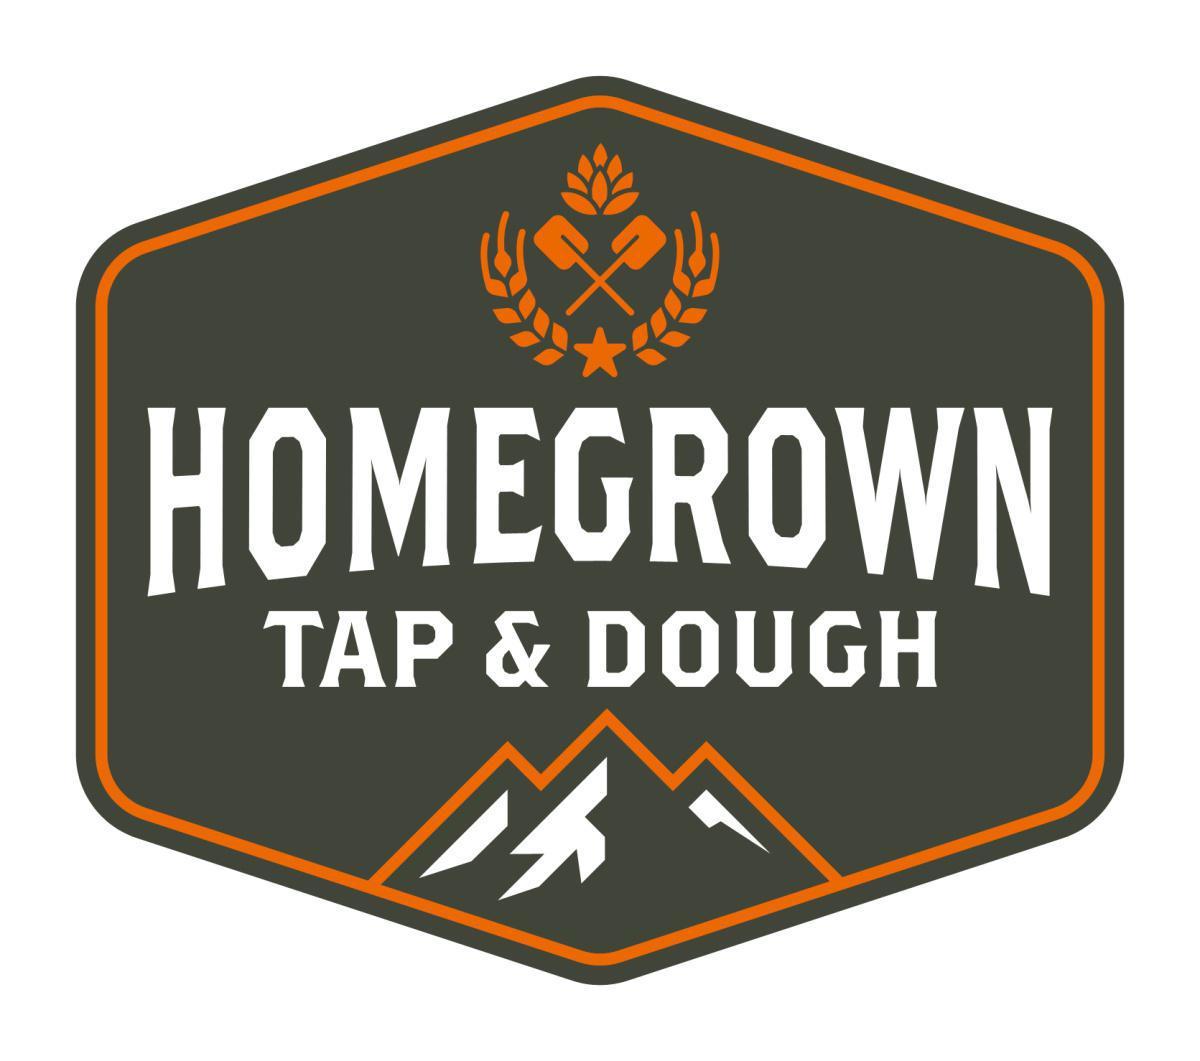 Homegrown Tap & Dough (10PM-MIDNIGHT)